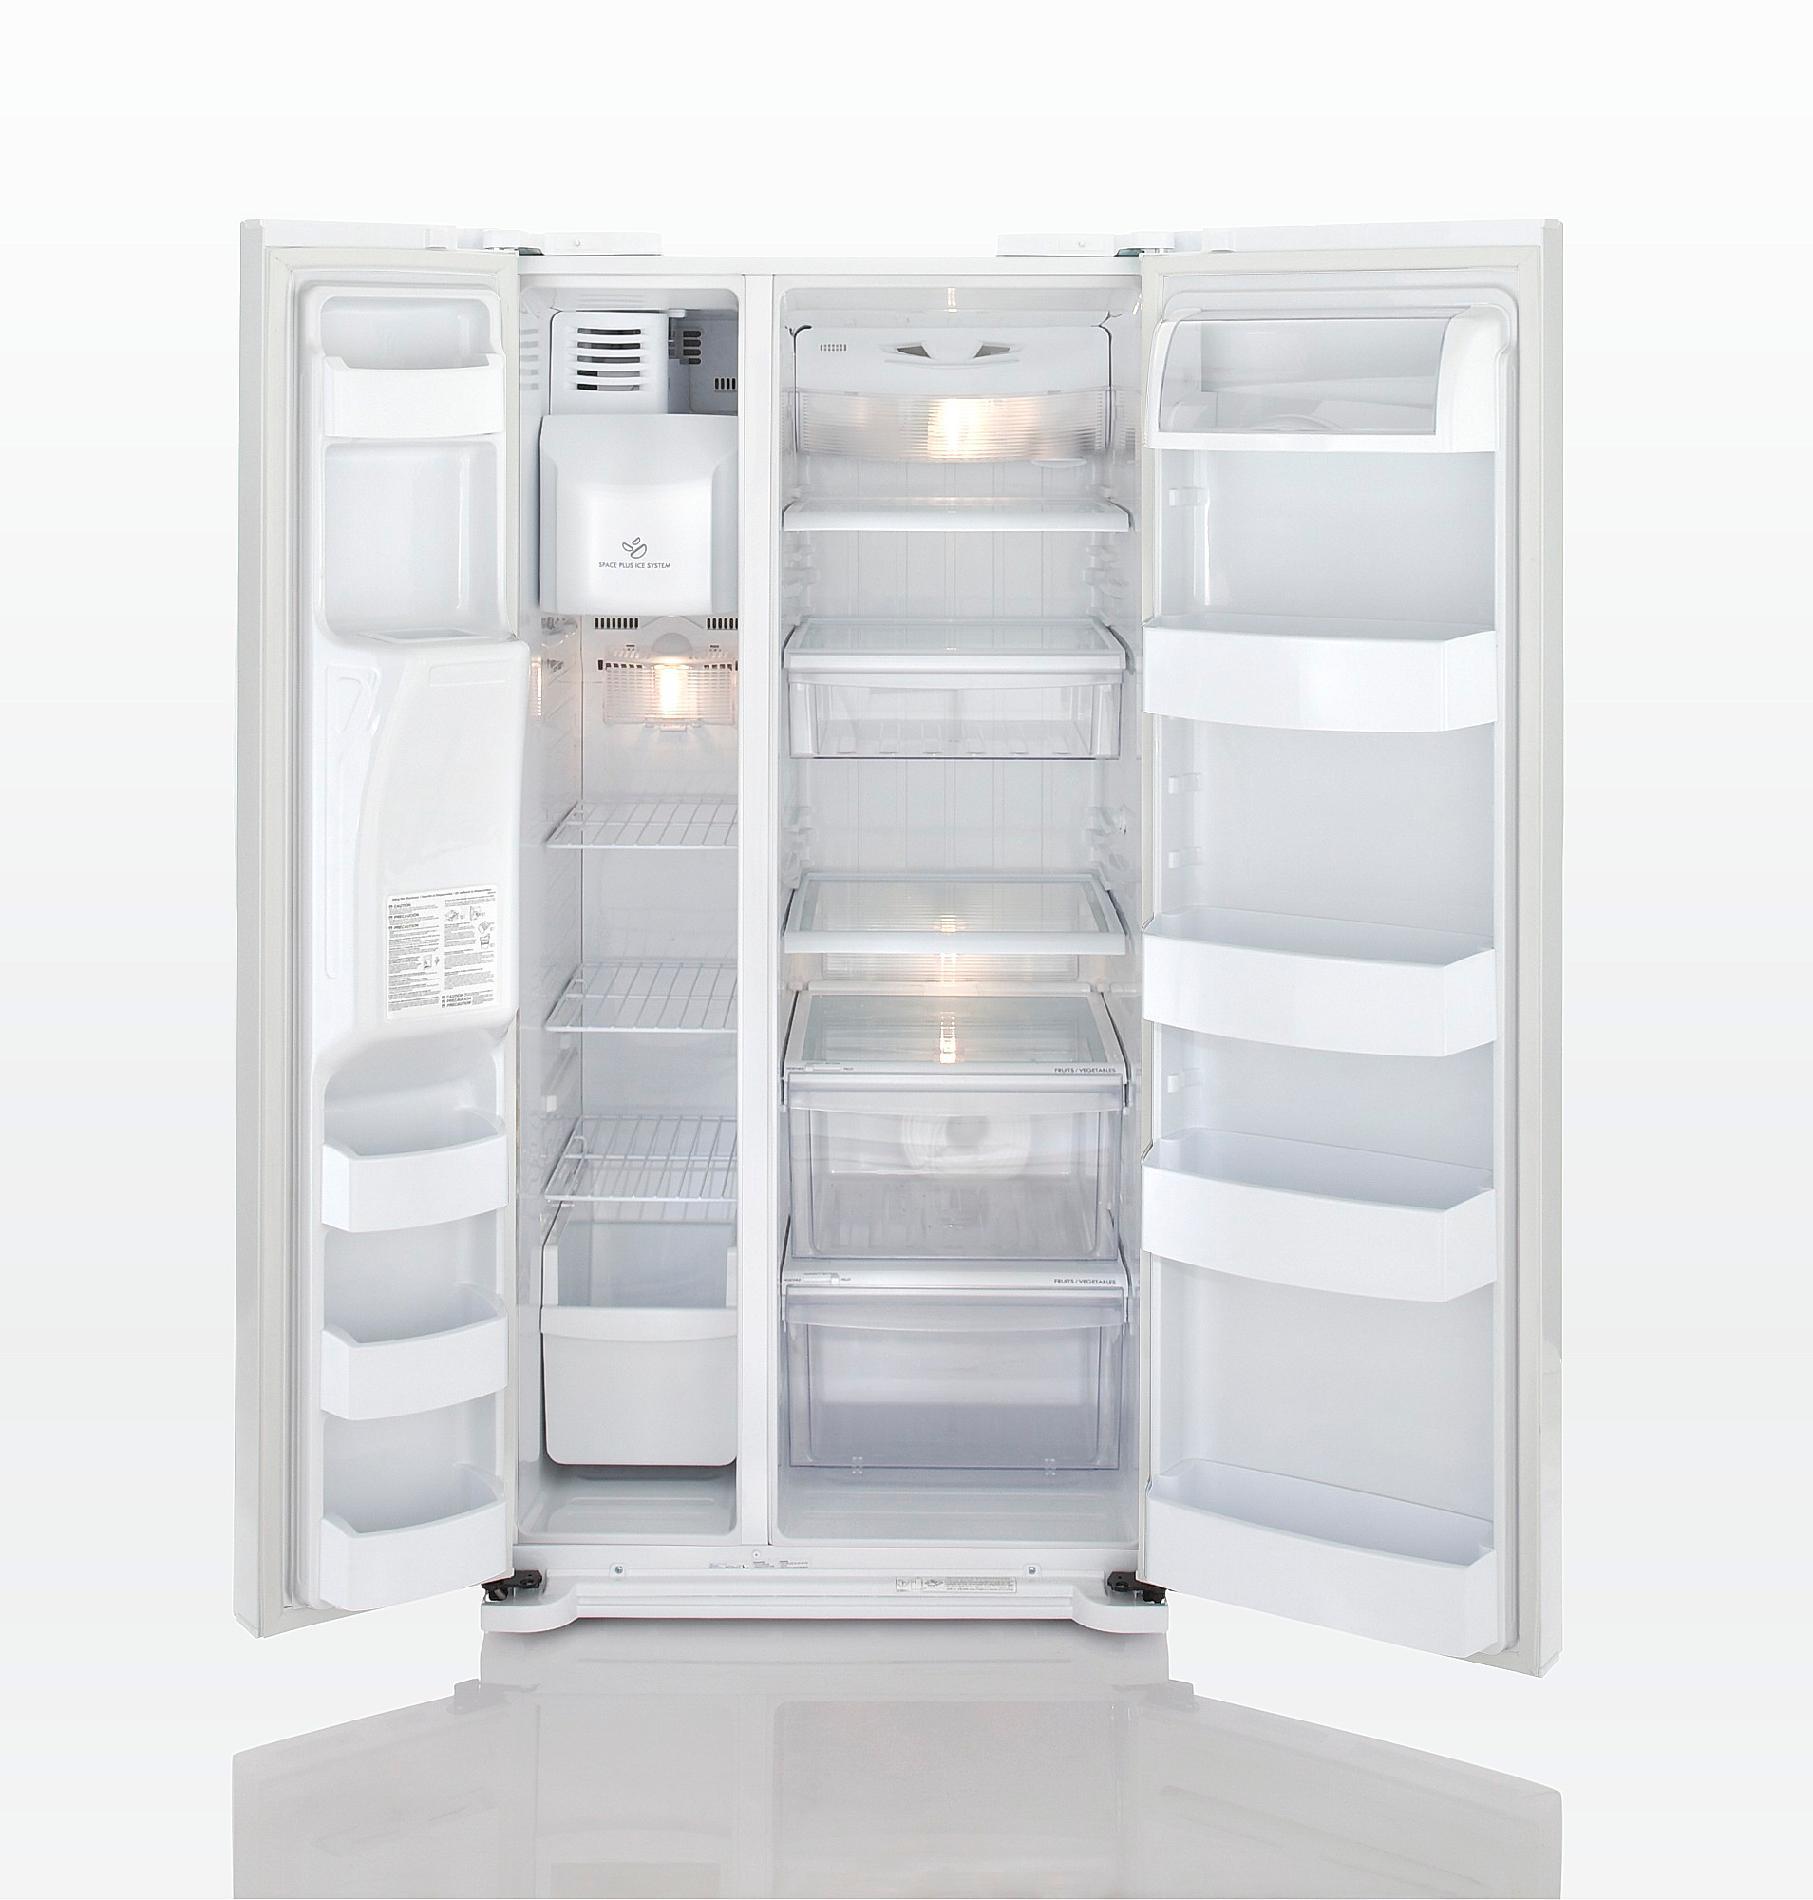 Kenmore 22.9 cu. ft. Side-By-Side Refrigerator